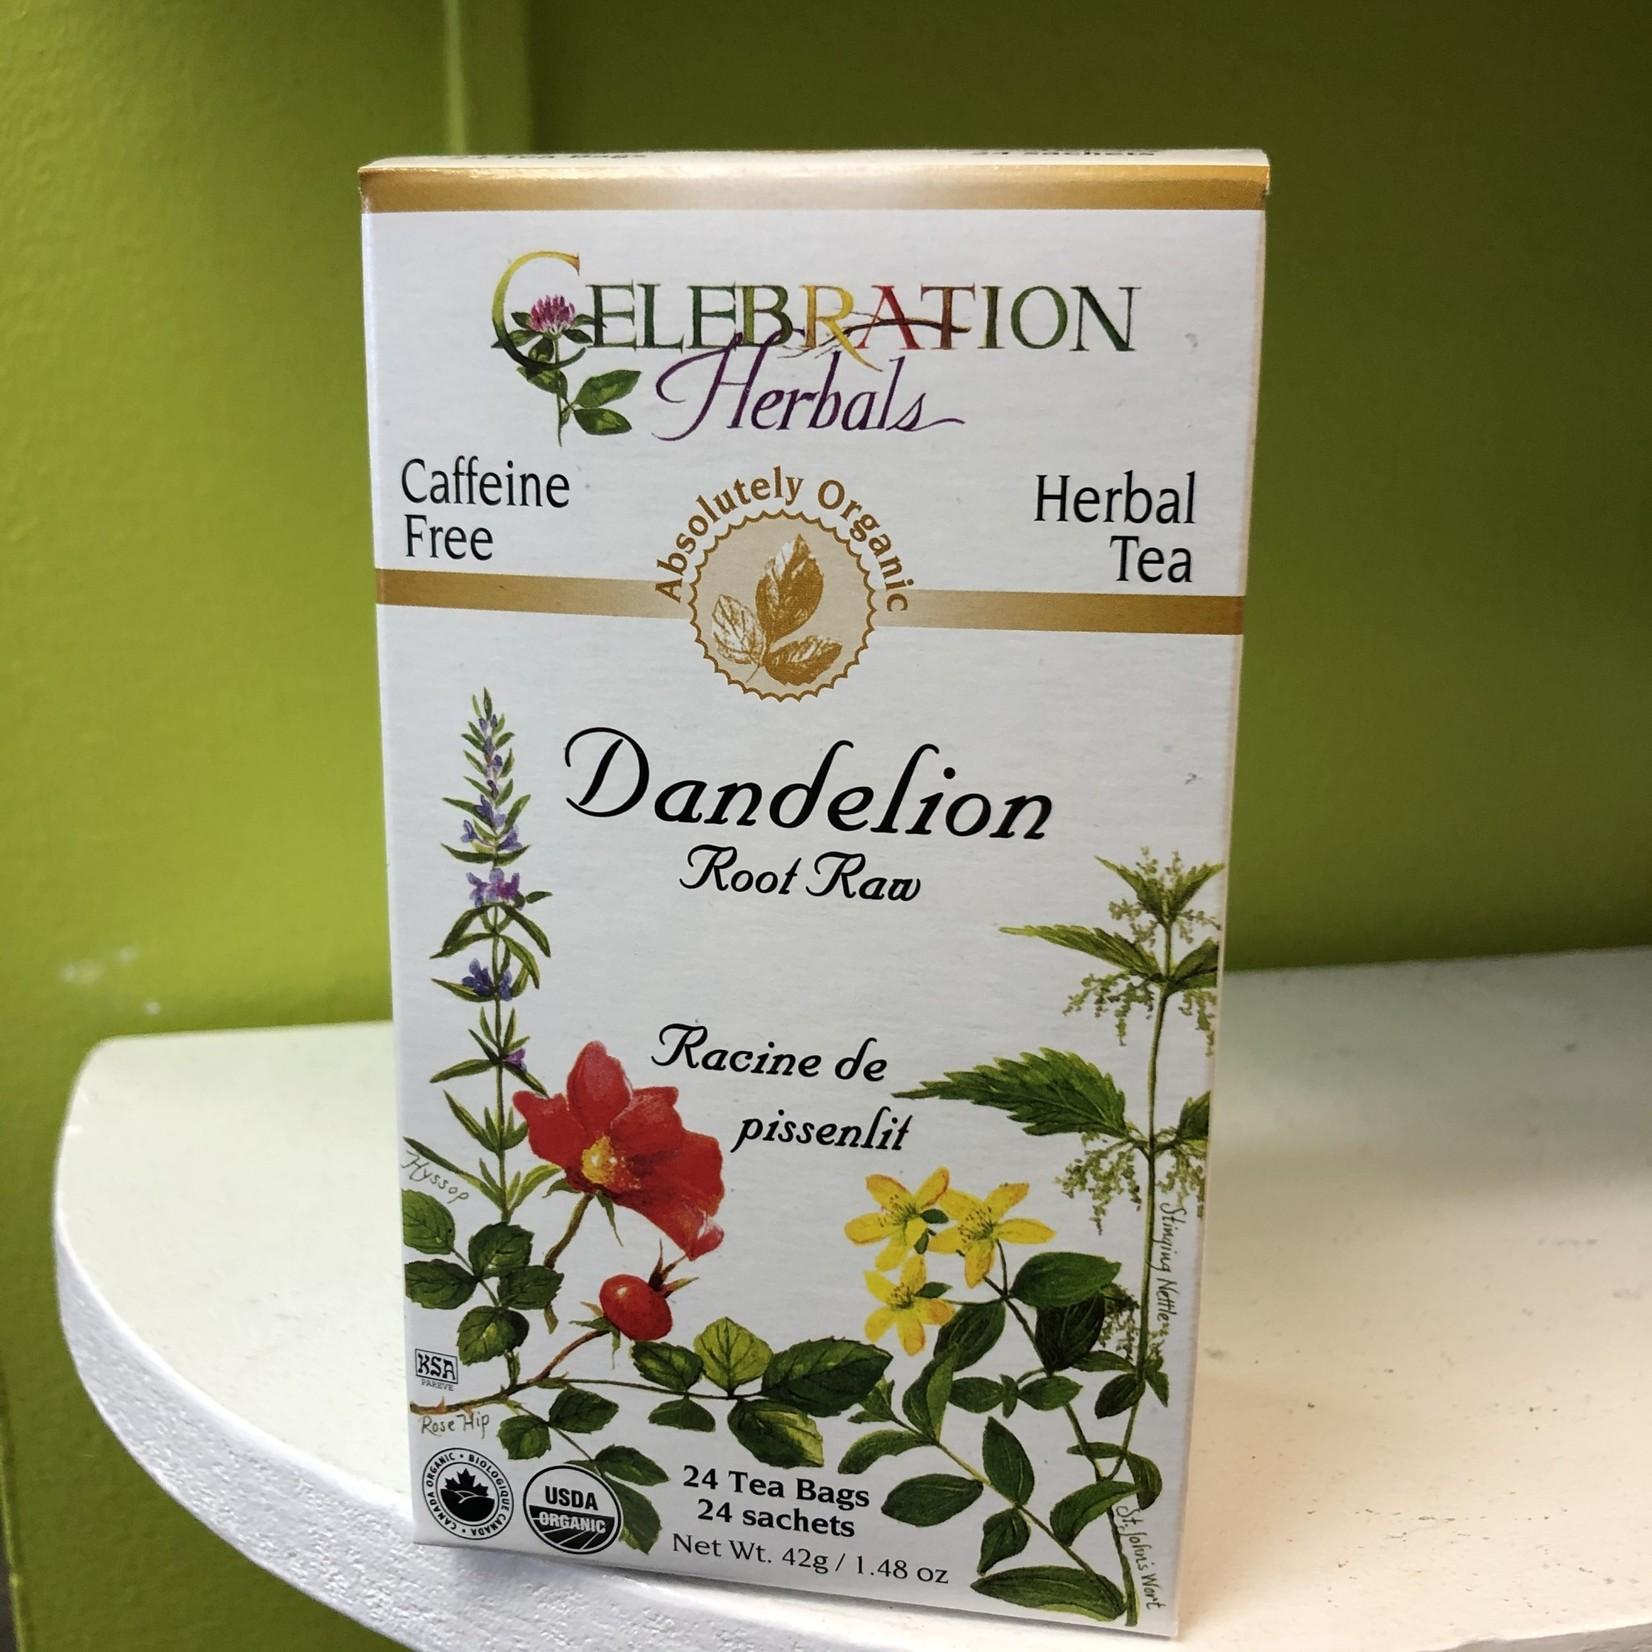 Celebration Herbals Celebration Herbals Dandelion Root Tea 24 Tea Bags